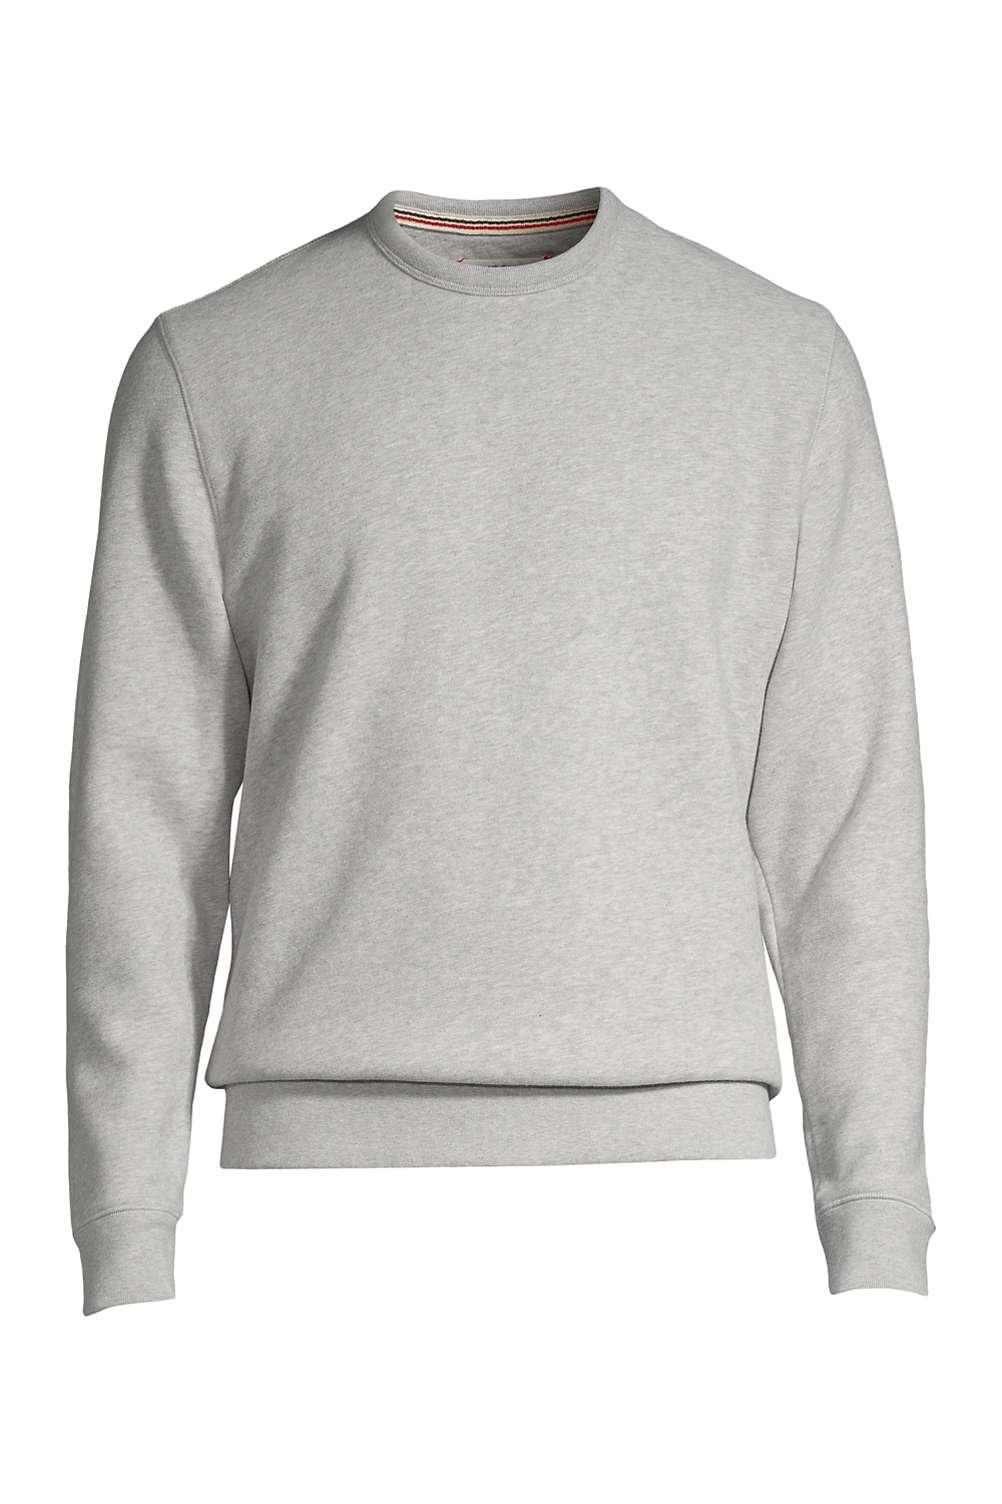 ec60e39d9 Men's Big and Tall Long Sleeve Serious Sweats Crewneck Sweatshirt ...